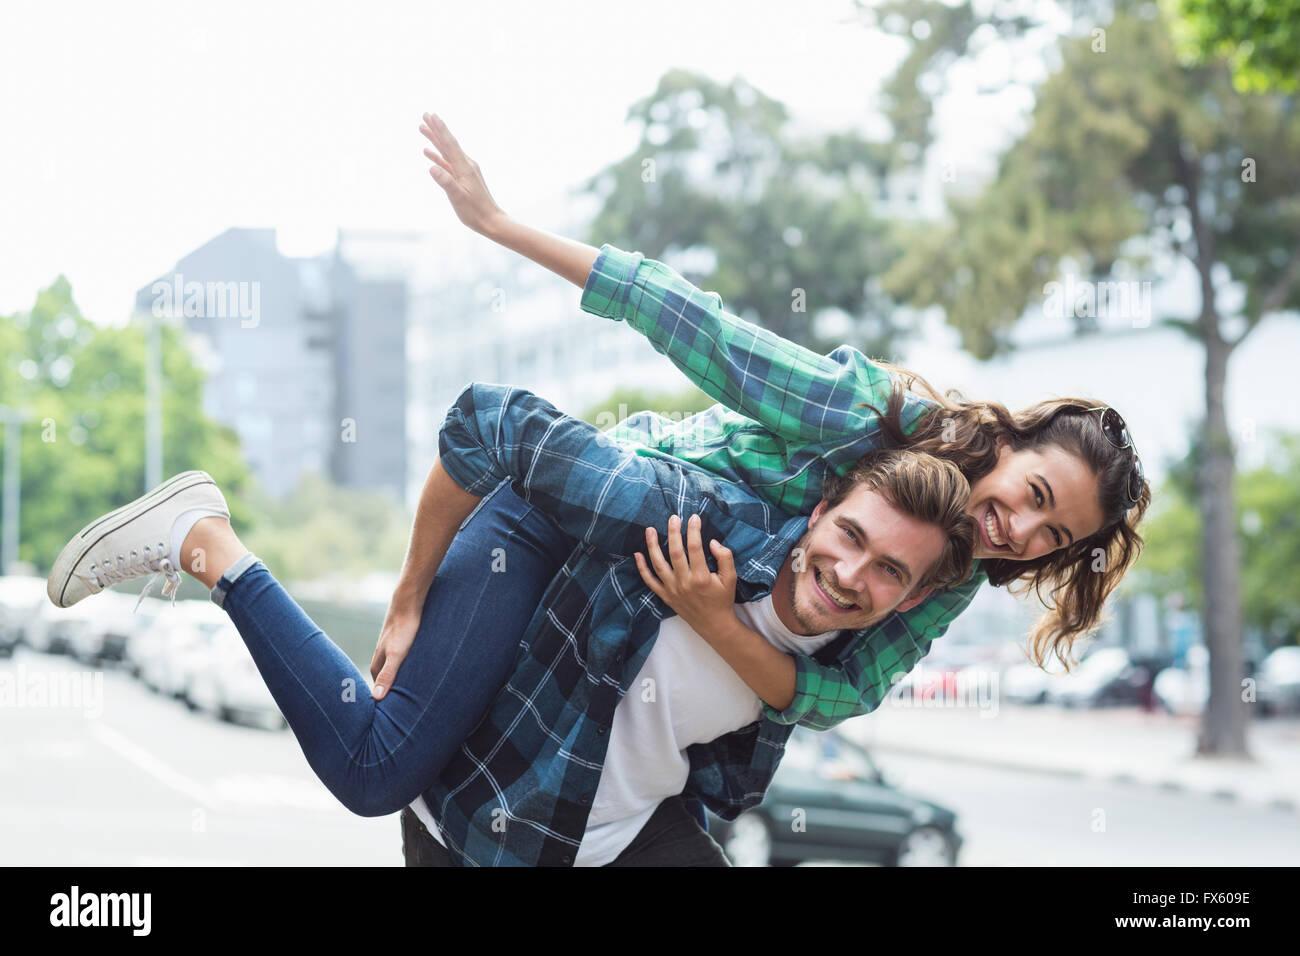 Man giving piggyback to woman - Stock Image